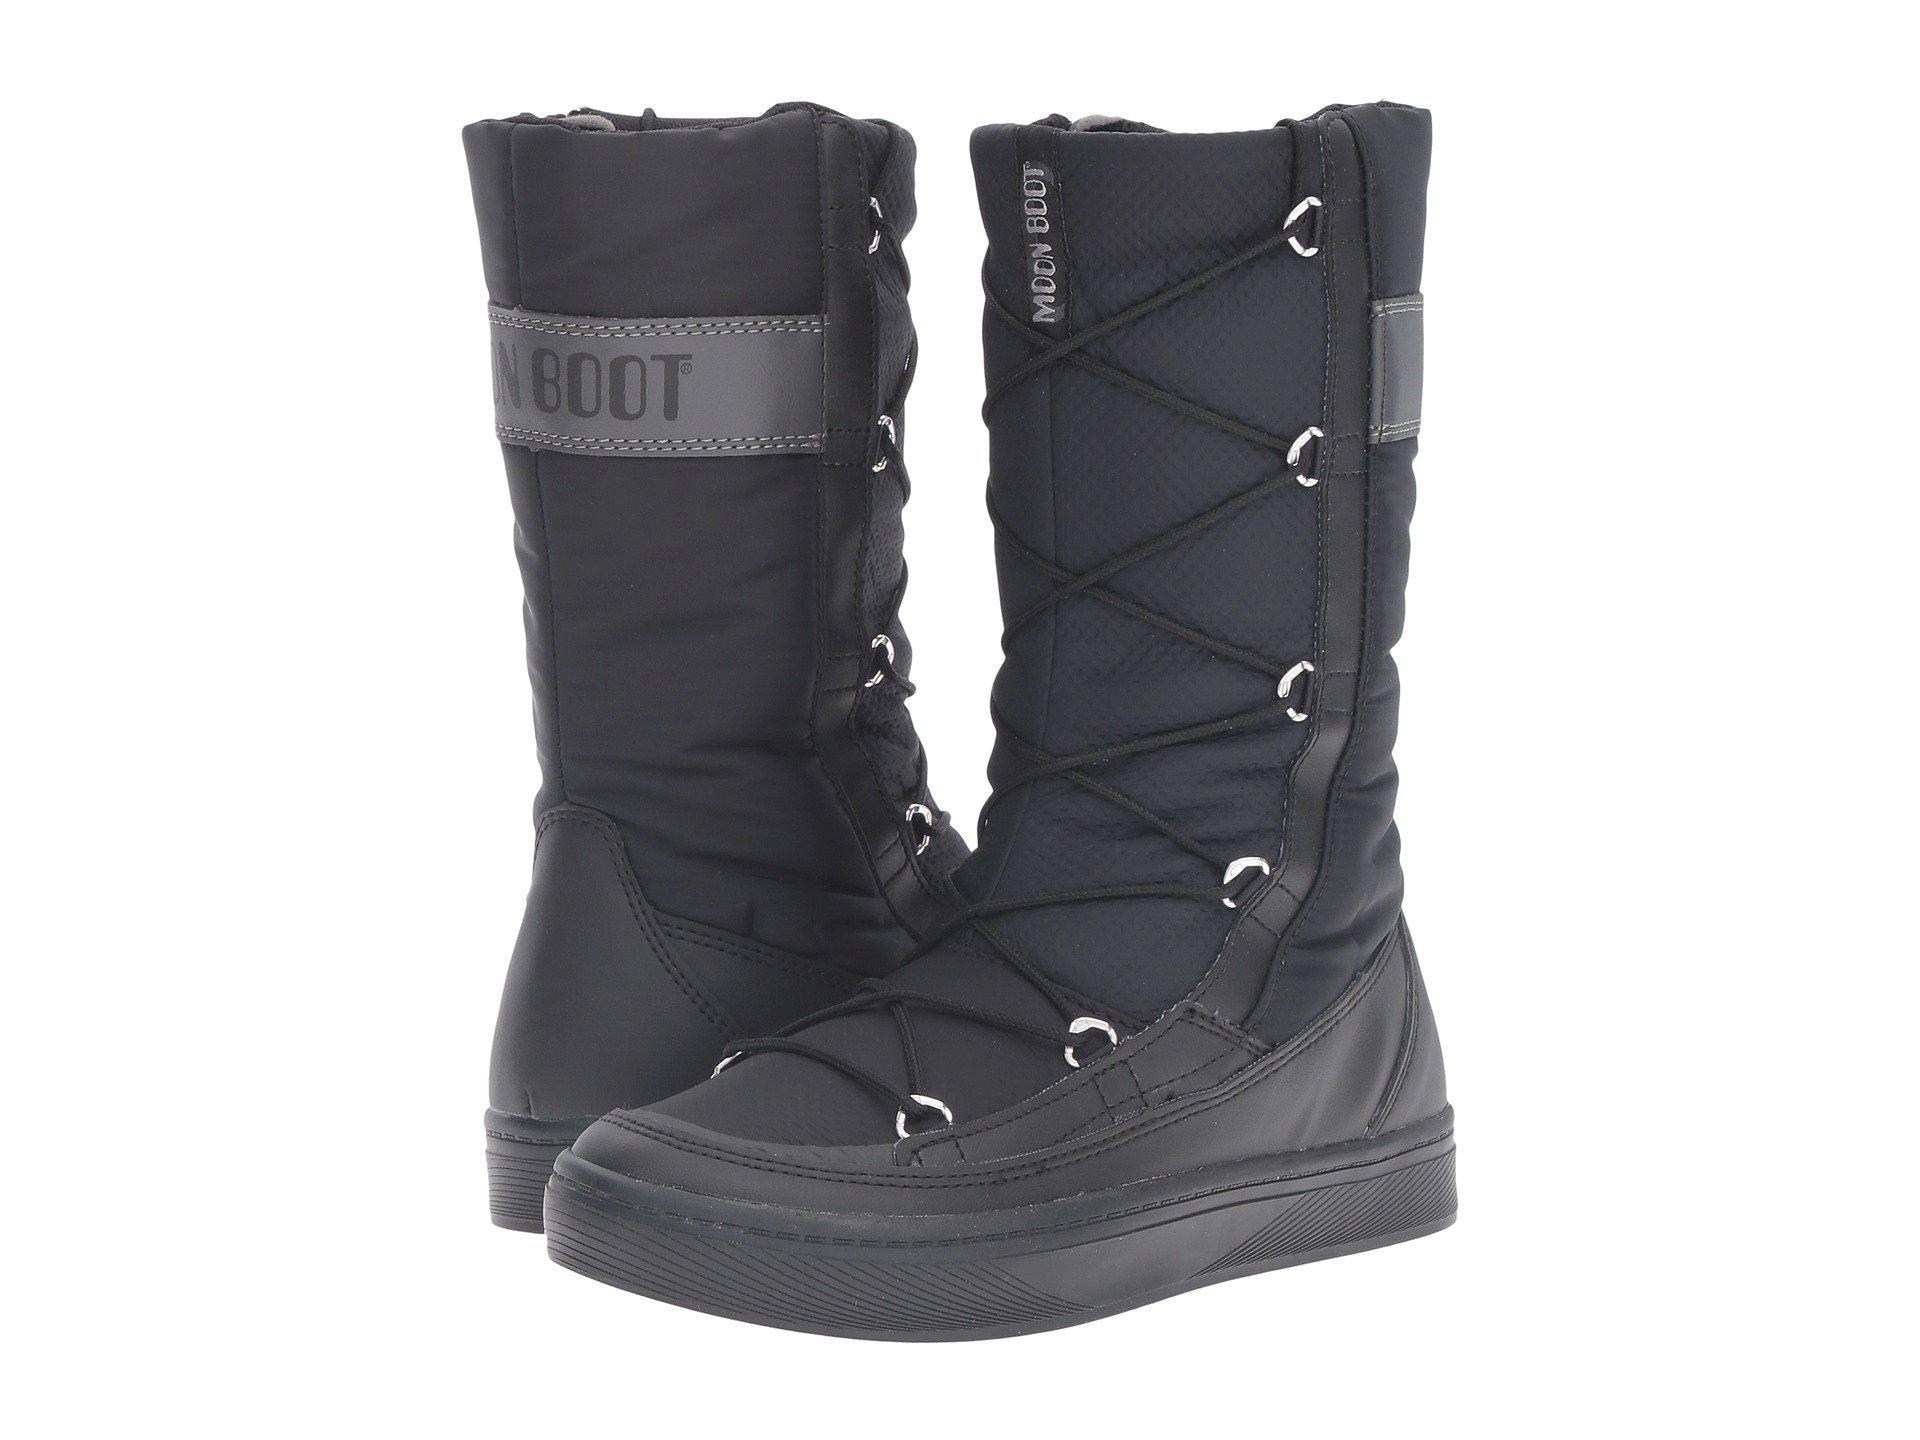 Women's Boots/moon boot black tecnica vega hi nd4b43j4